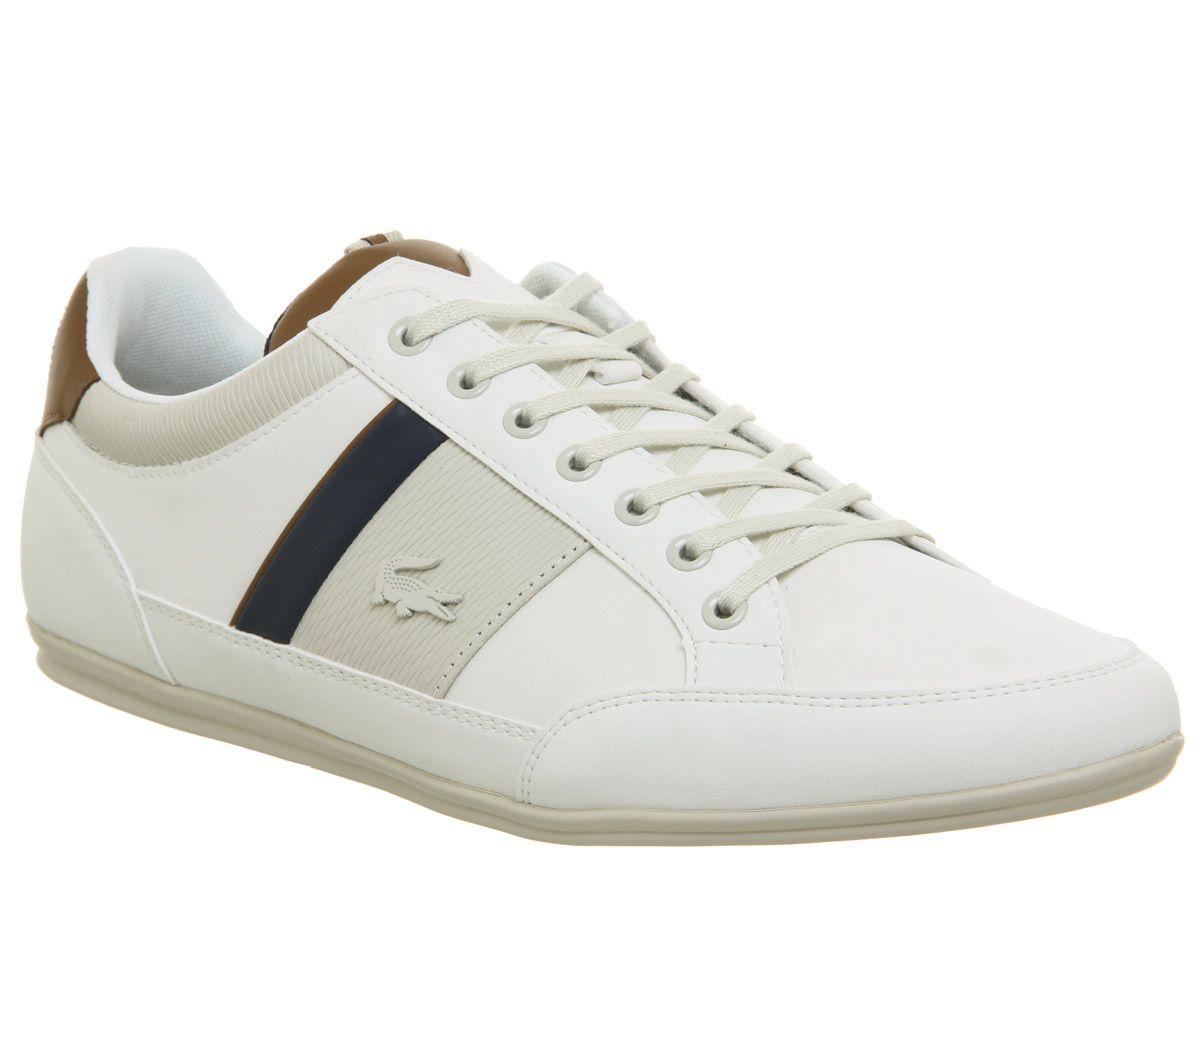 b4345e0ad Lacoste Chaymon Trainers Off White - His trainers